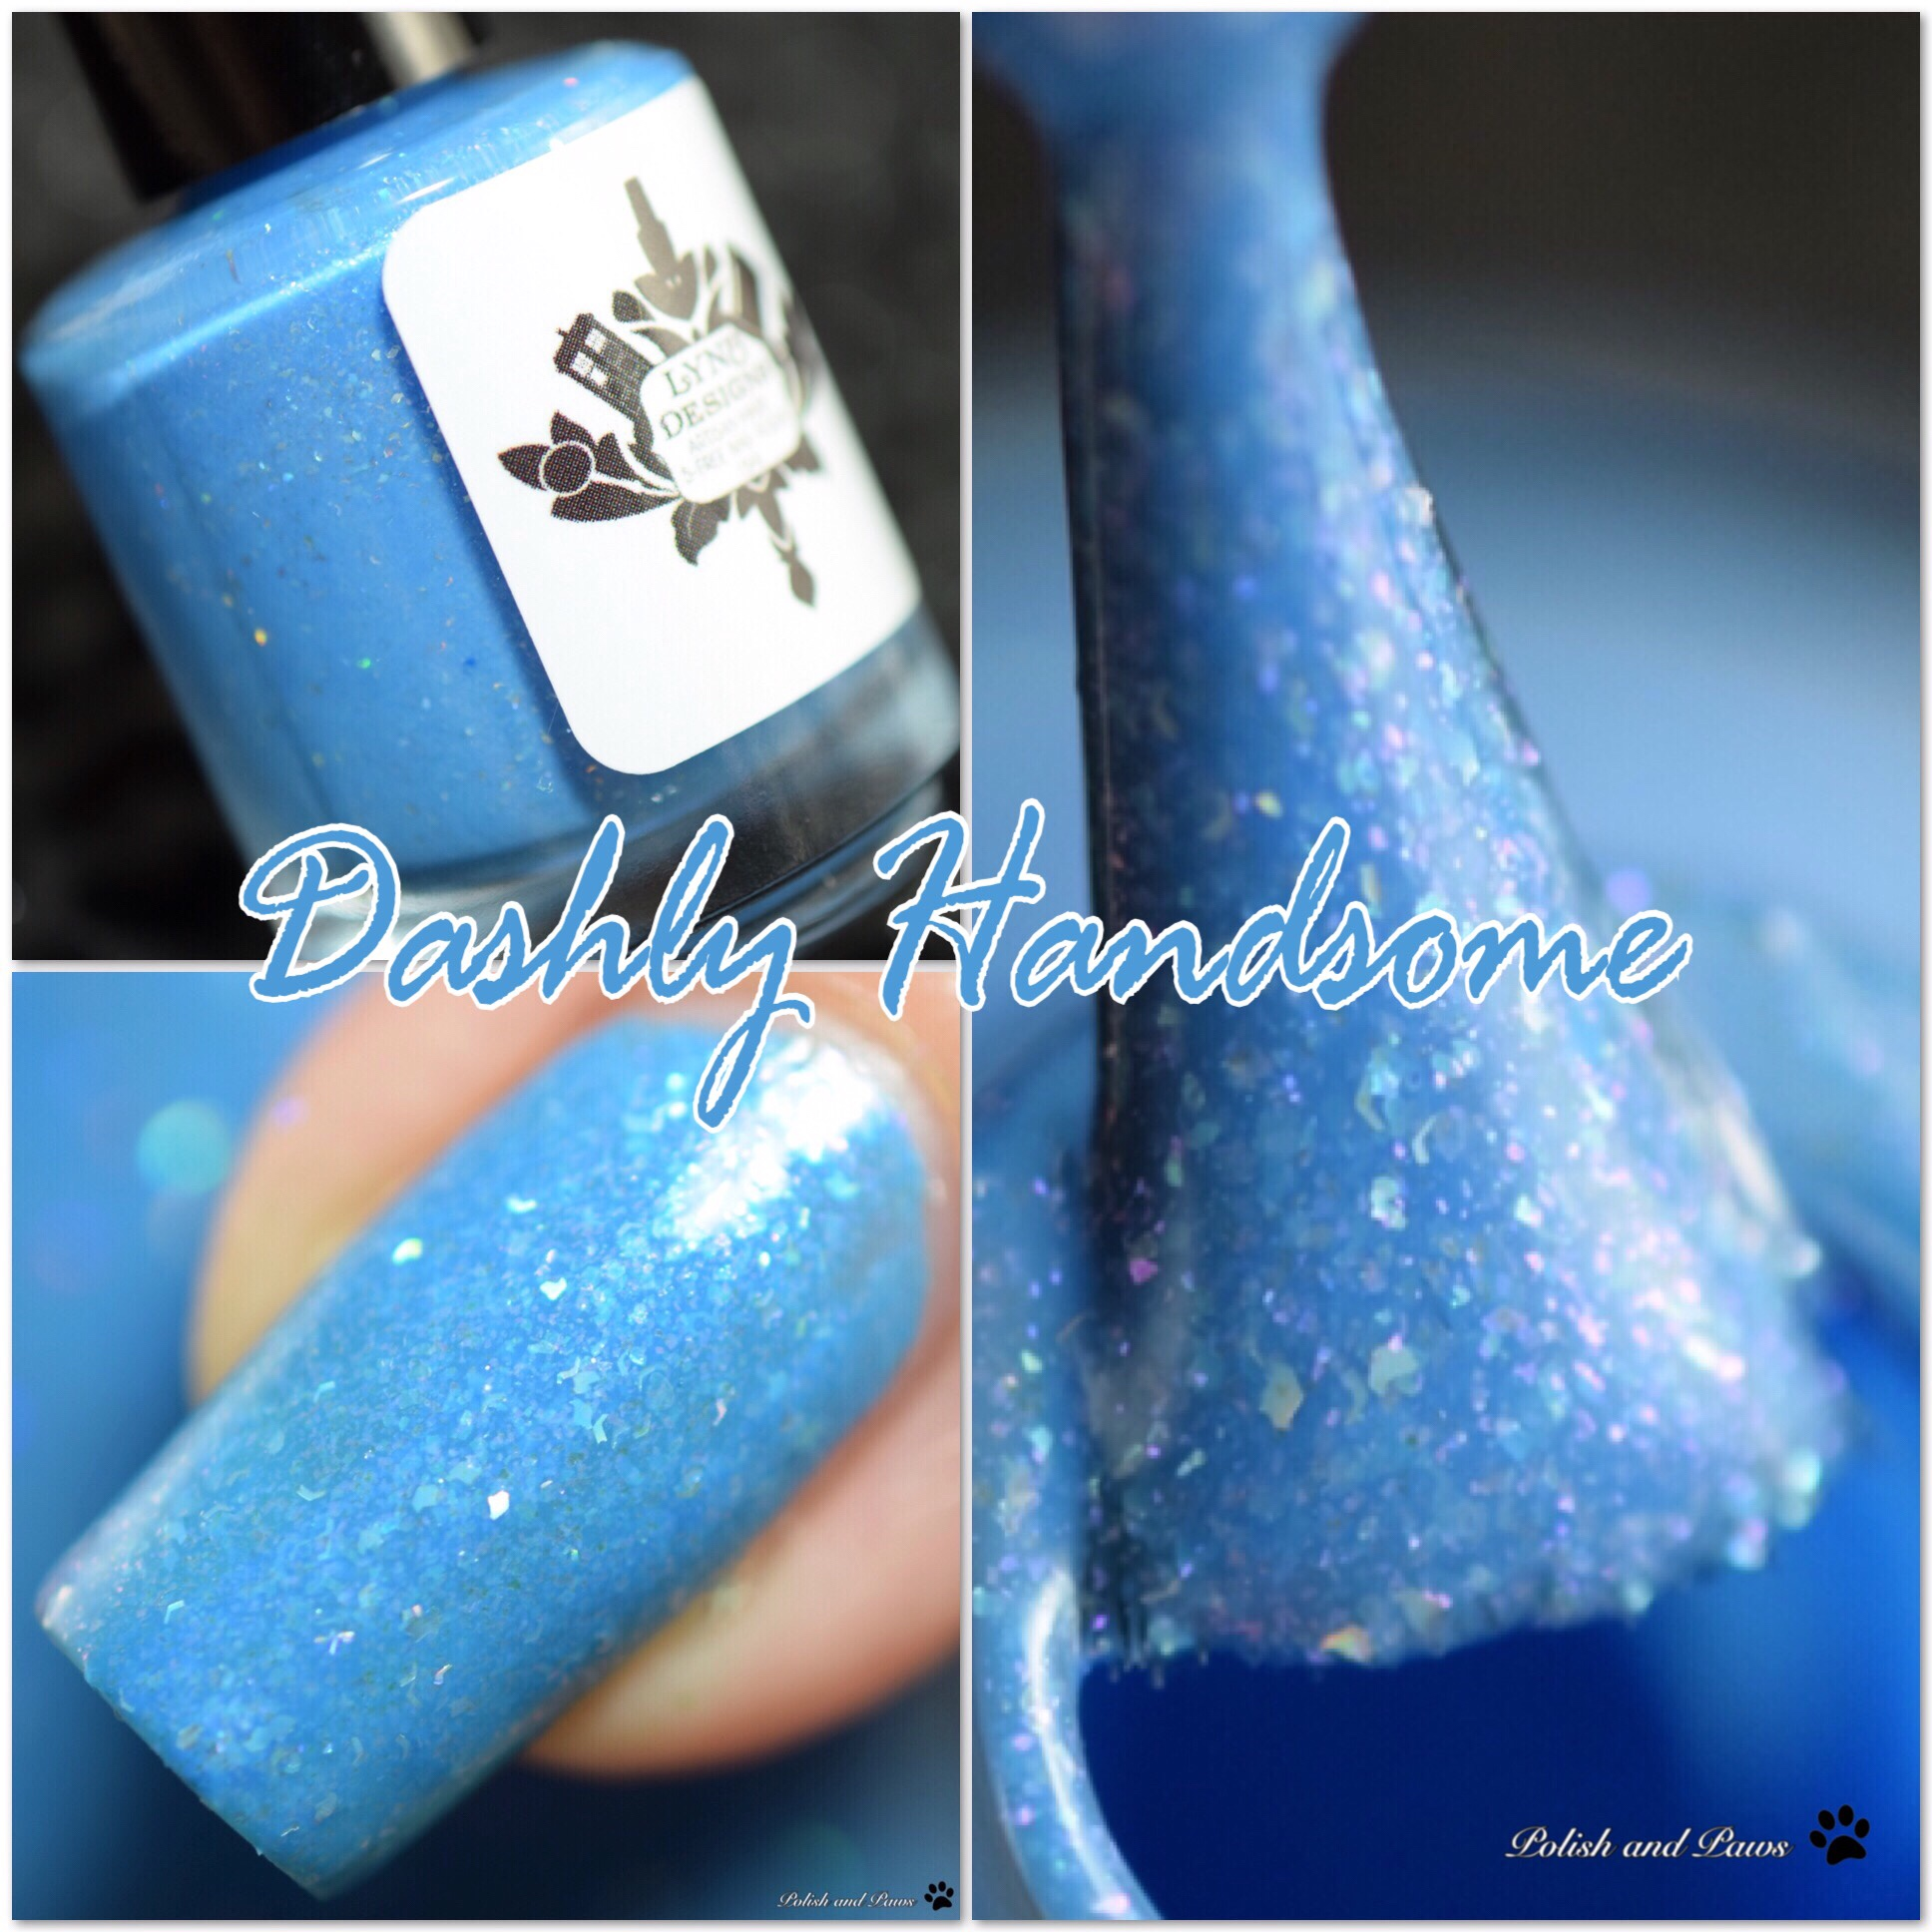 LynB Designs Dashly Handsome